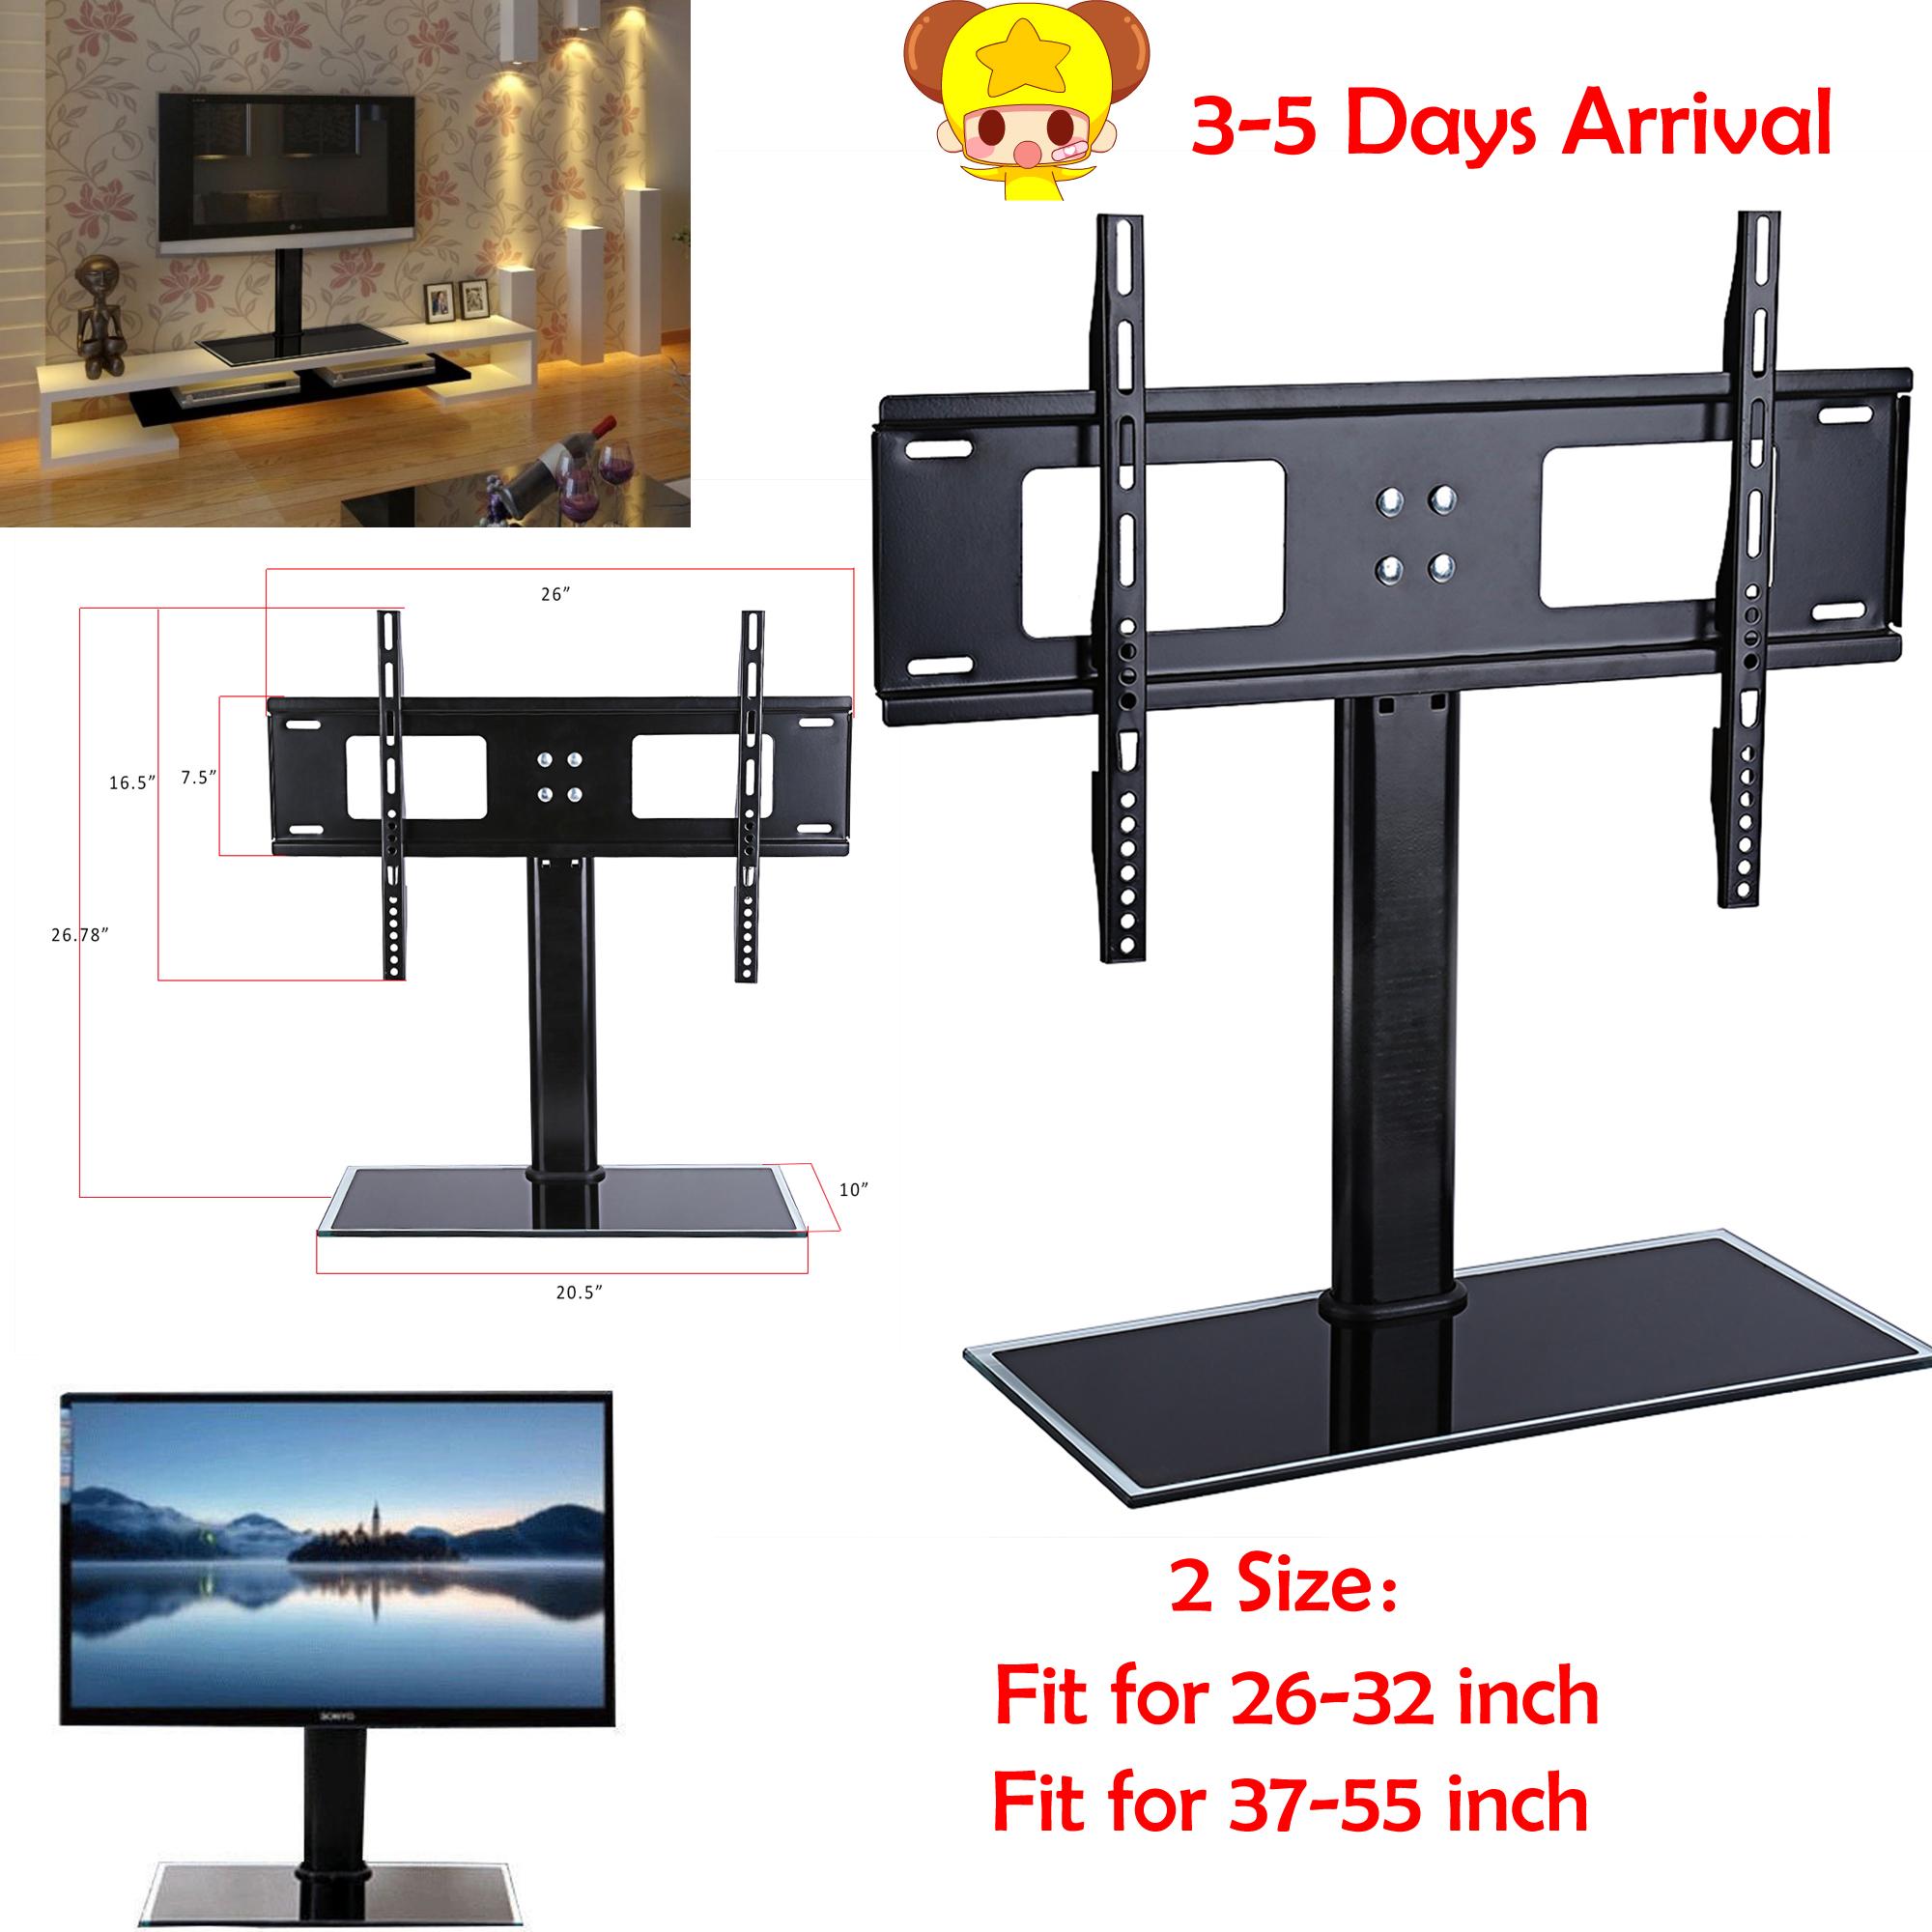 series furniture flat hooks morrisseysfamilybutchers com luxor uk tv stand screen corner height mount pedestal adjustable nz